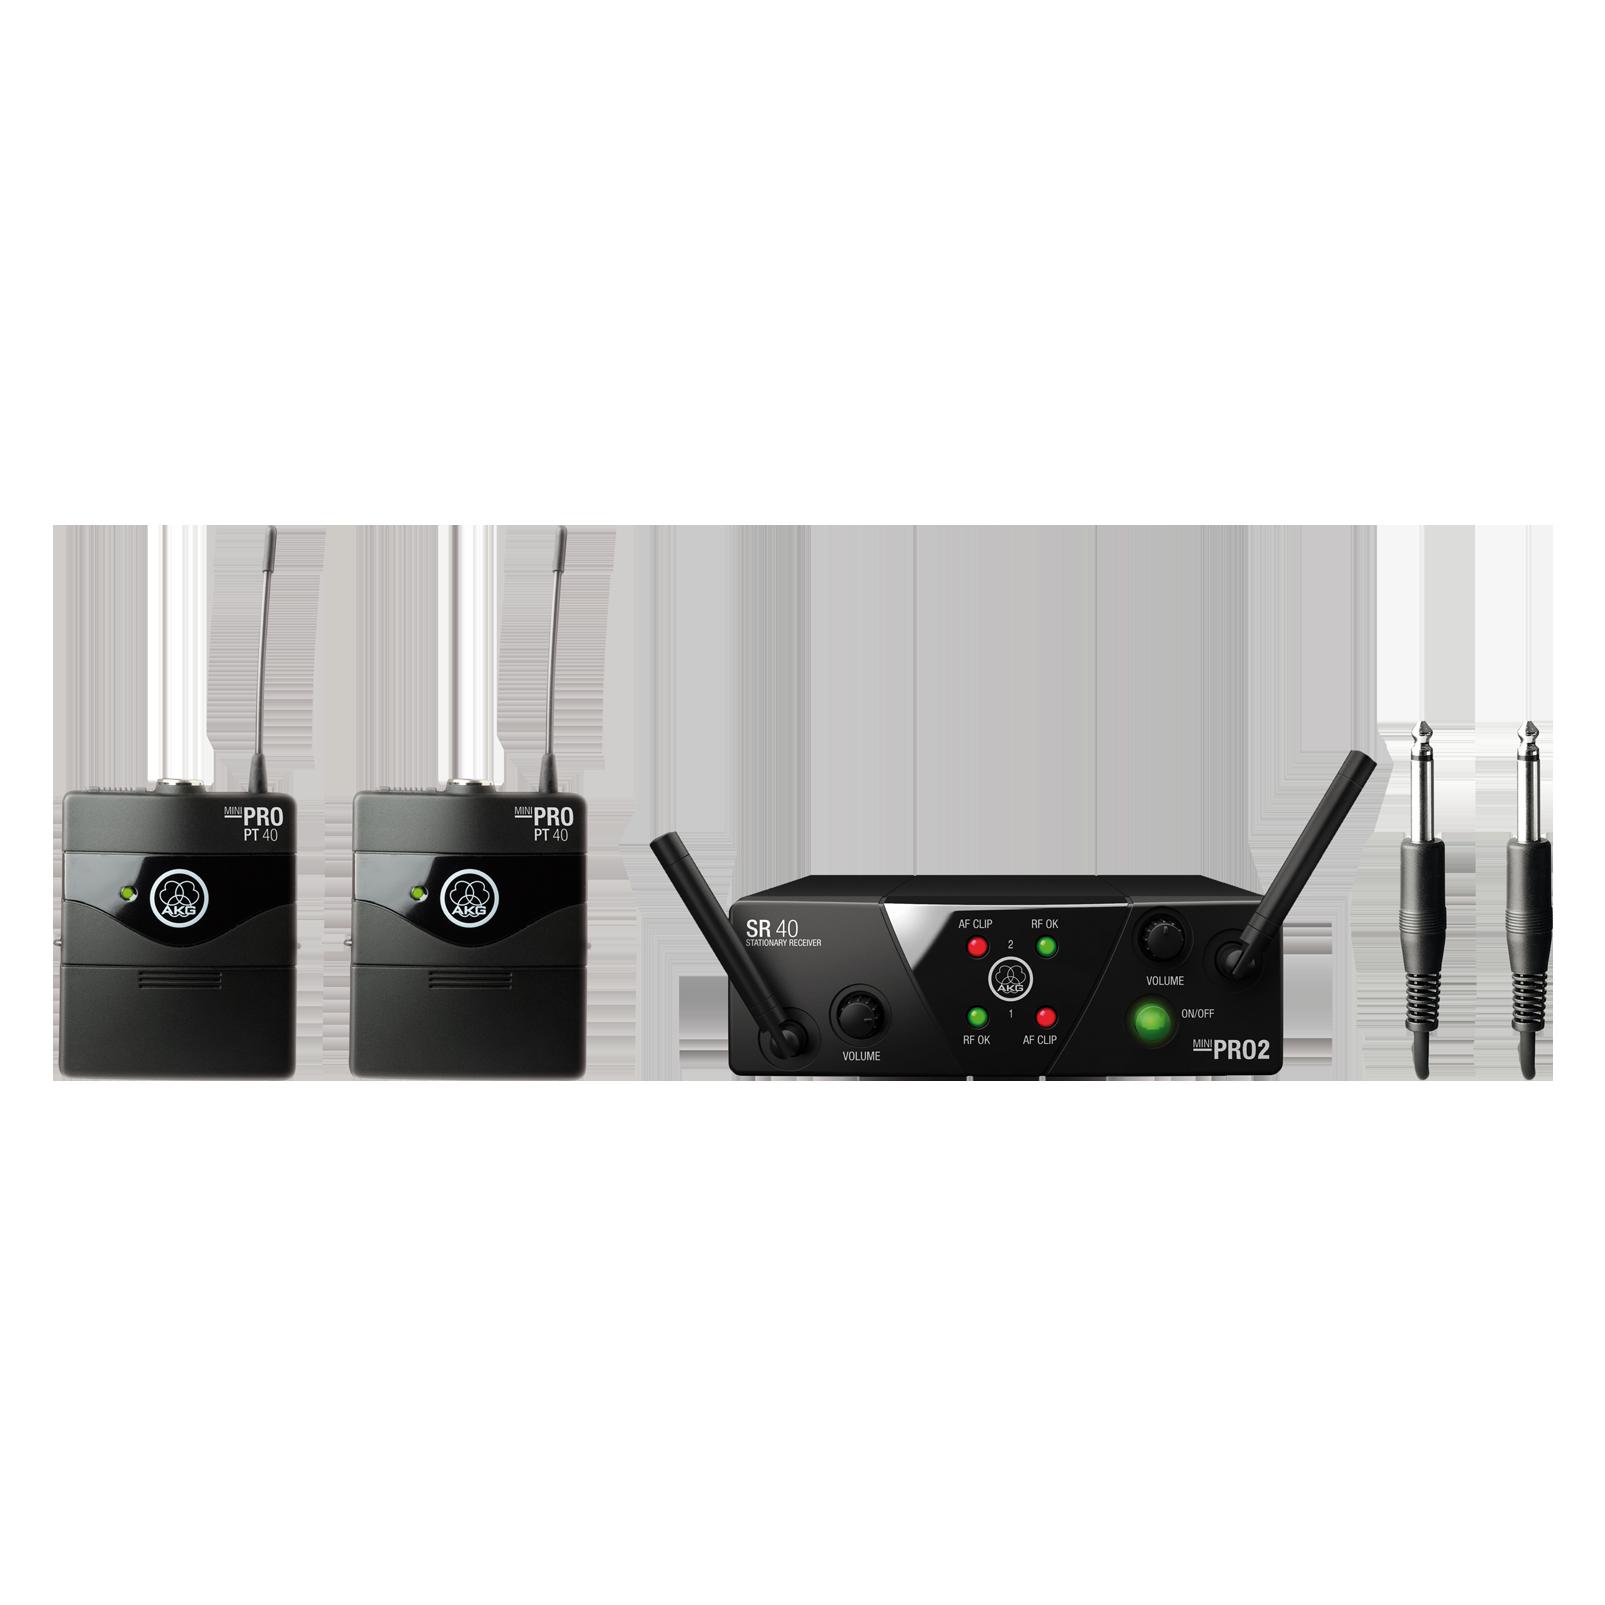 WMS40 Mini Dual Instrumental Set Band-US25-A/C - Black - Wireless microphone system - Hero